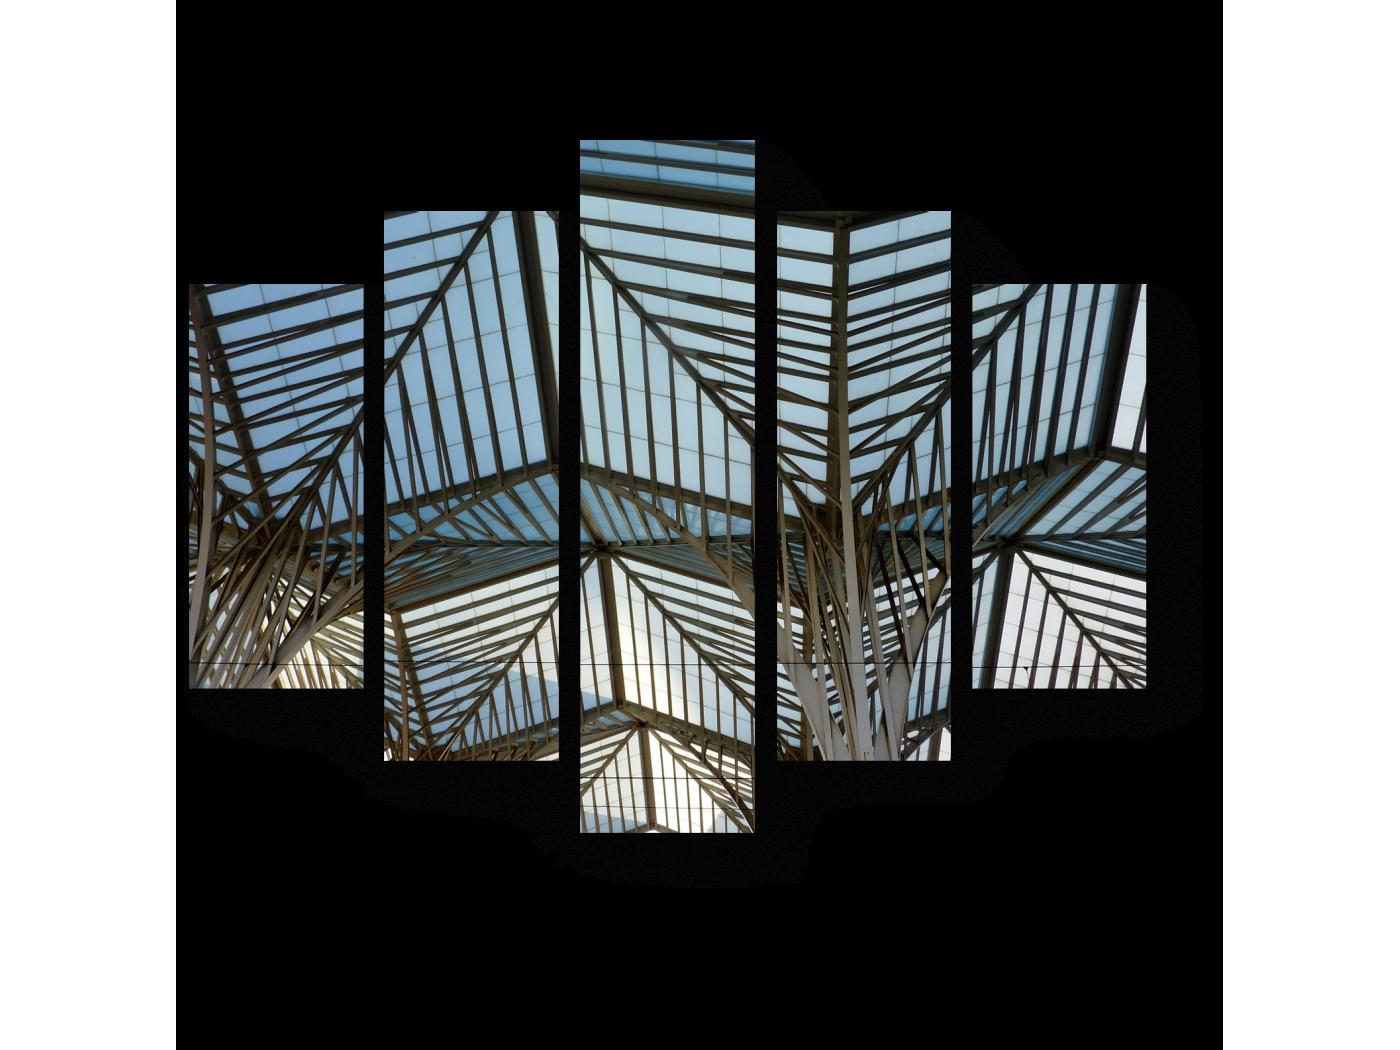 Модульная картина Станция в Лиссабоне (75x60) фото